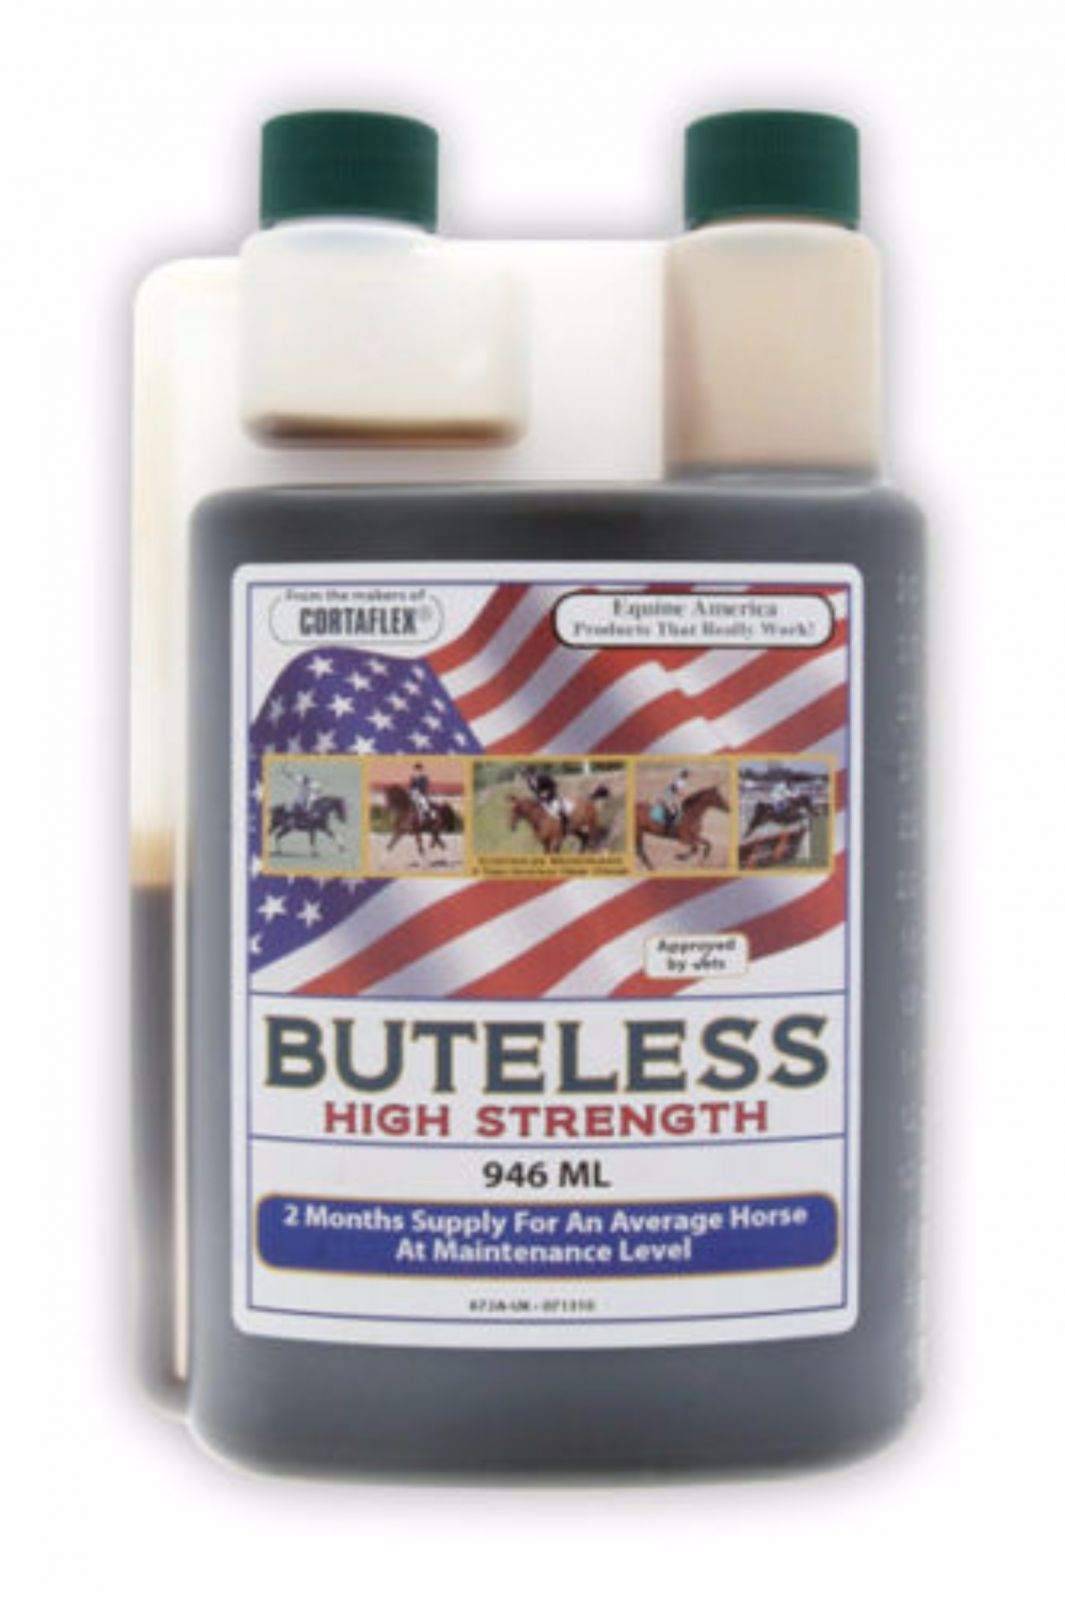 Equine America Buteless High Strength